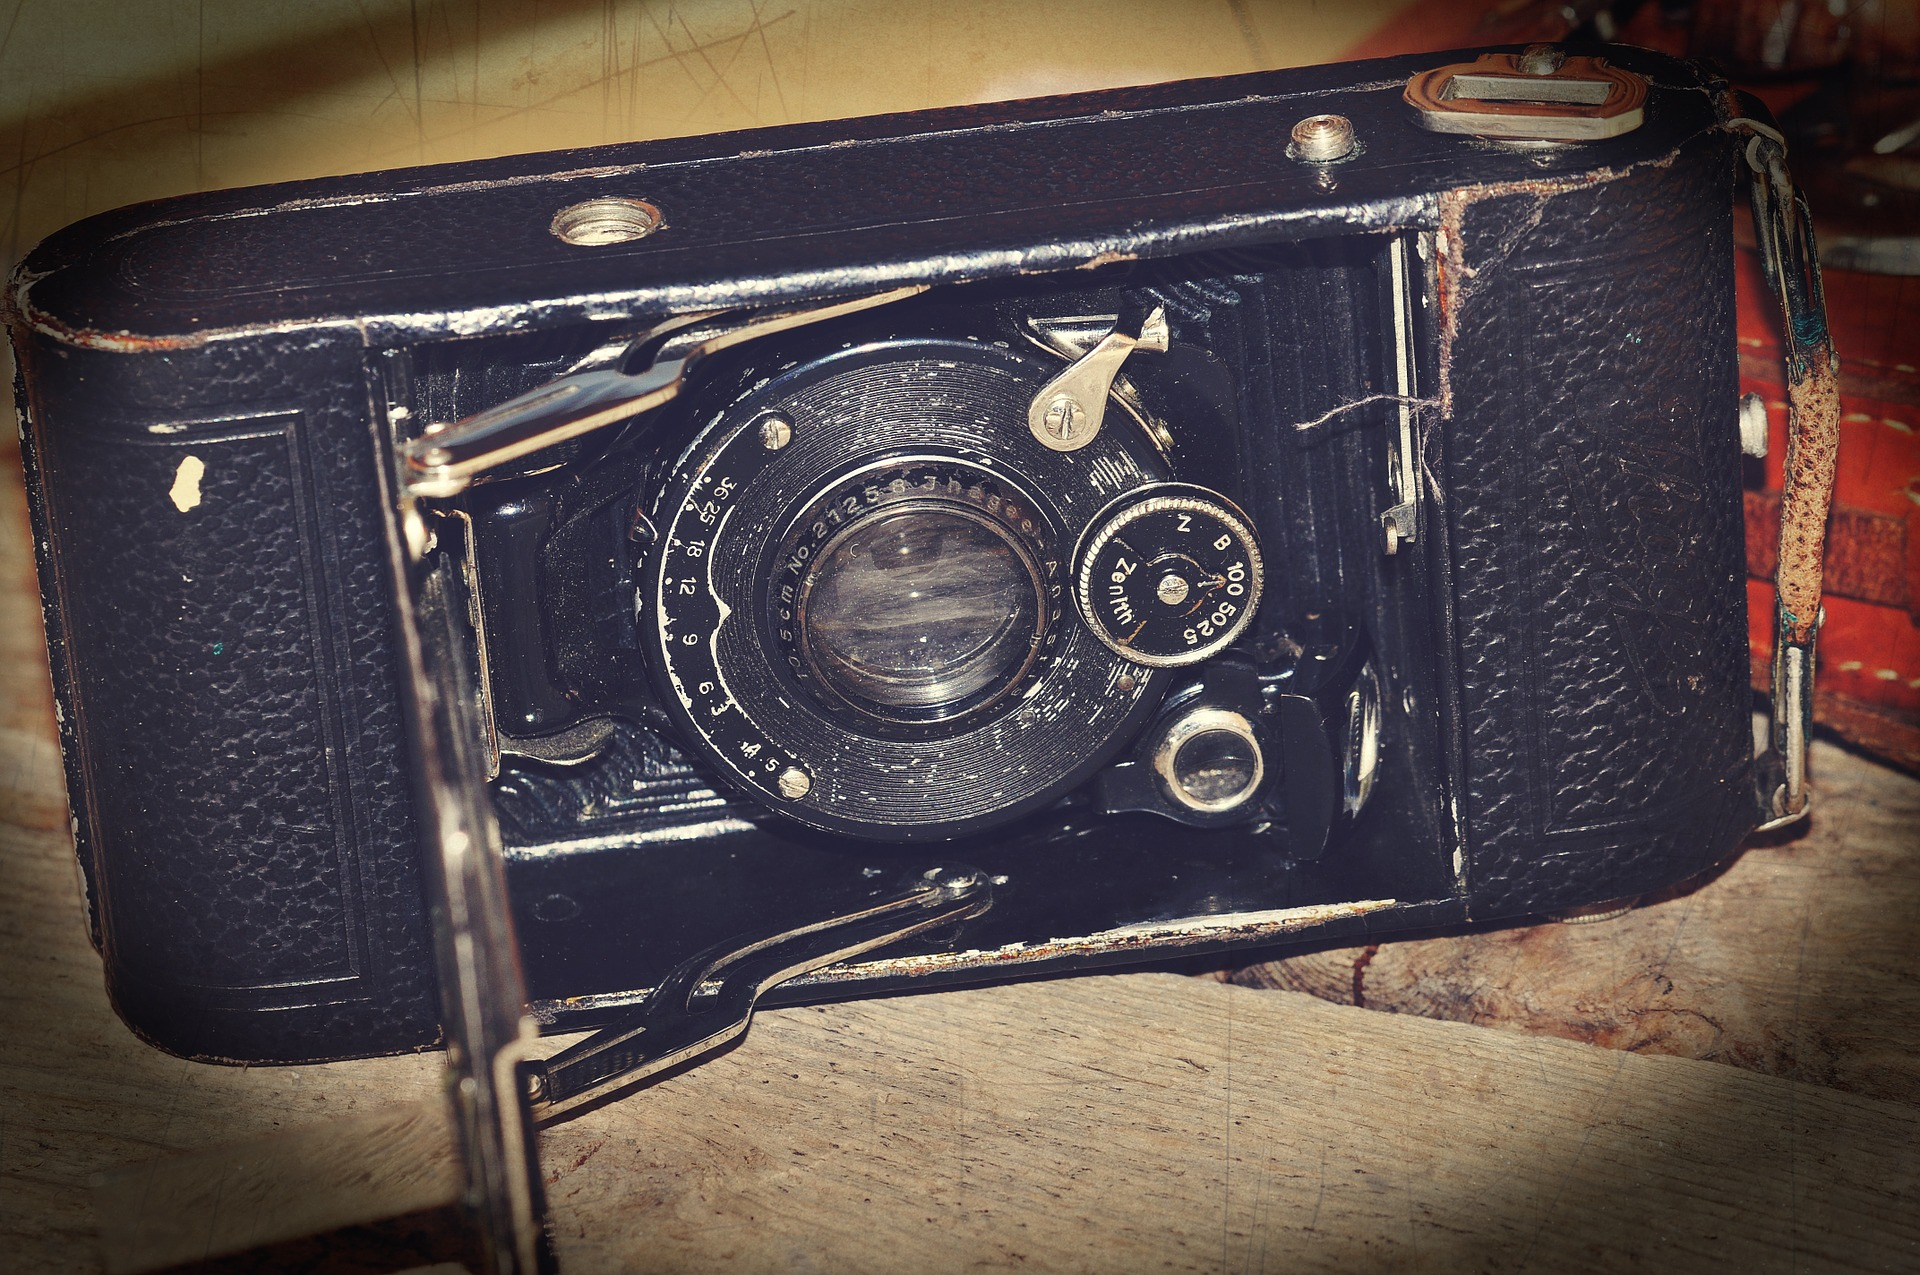 Profession, Camera, Focus, Kodak, Lens, HQ Photo